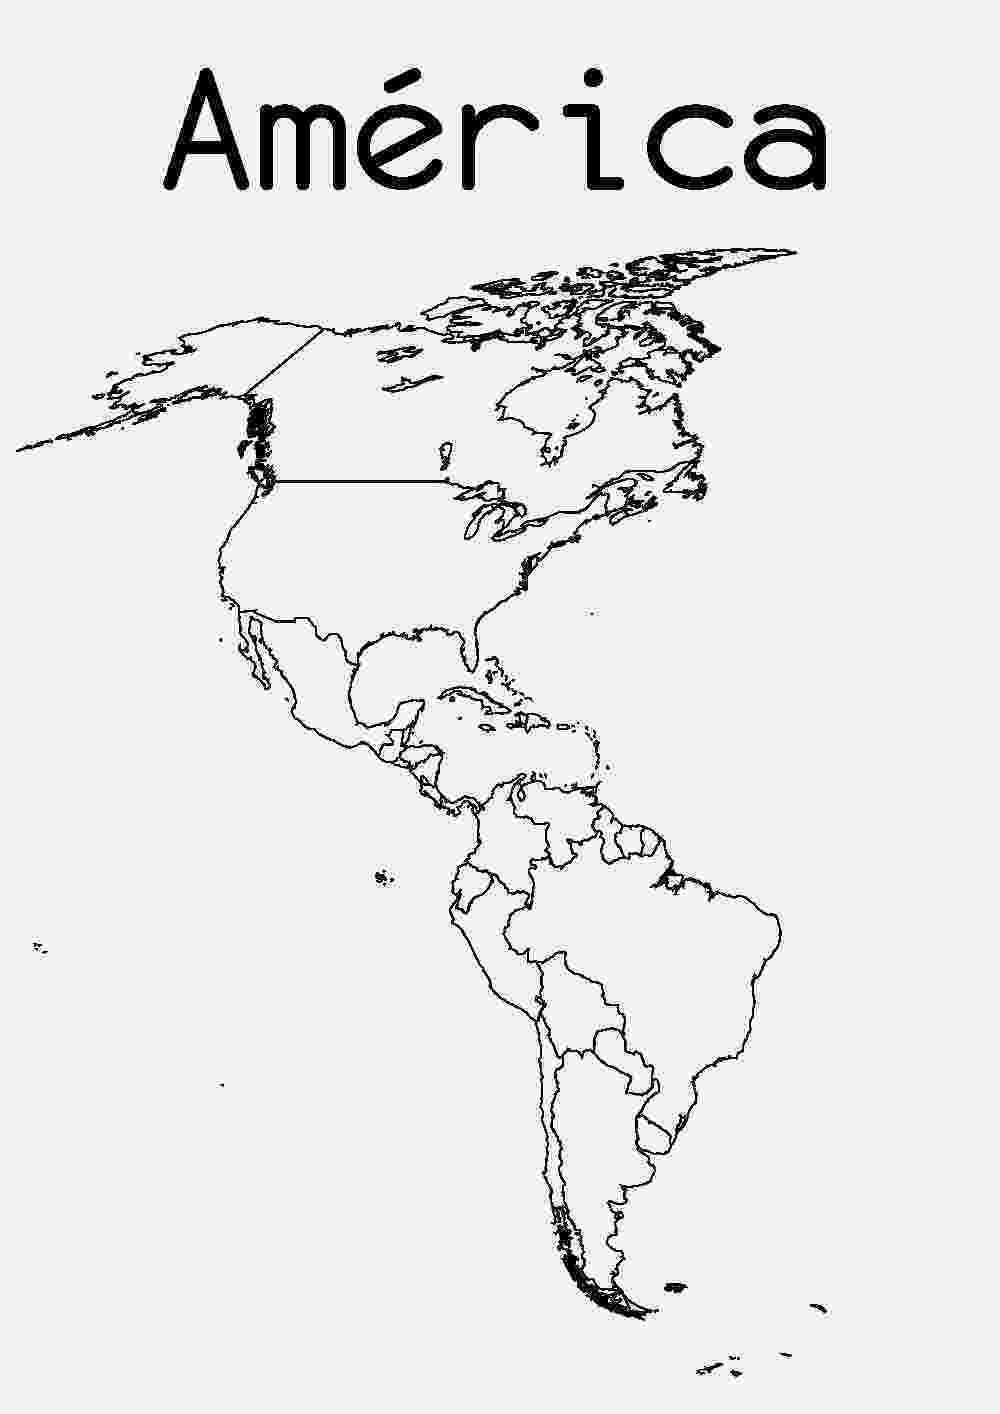 mapa de centroamerica mapa con los 5 continentes del mundo sp mapas mapa centroamerica de